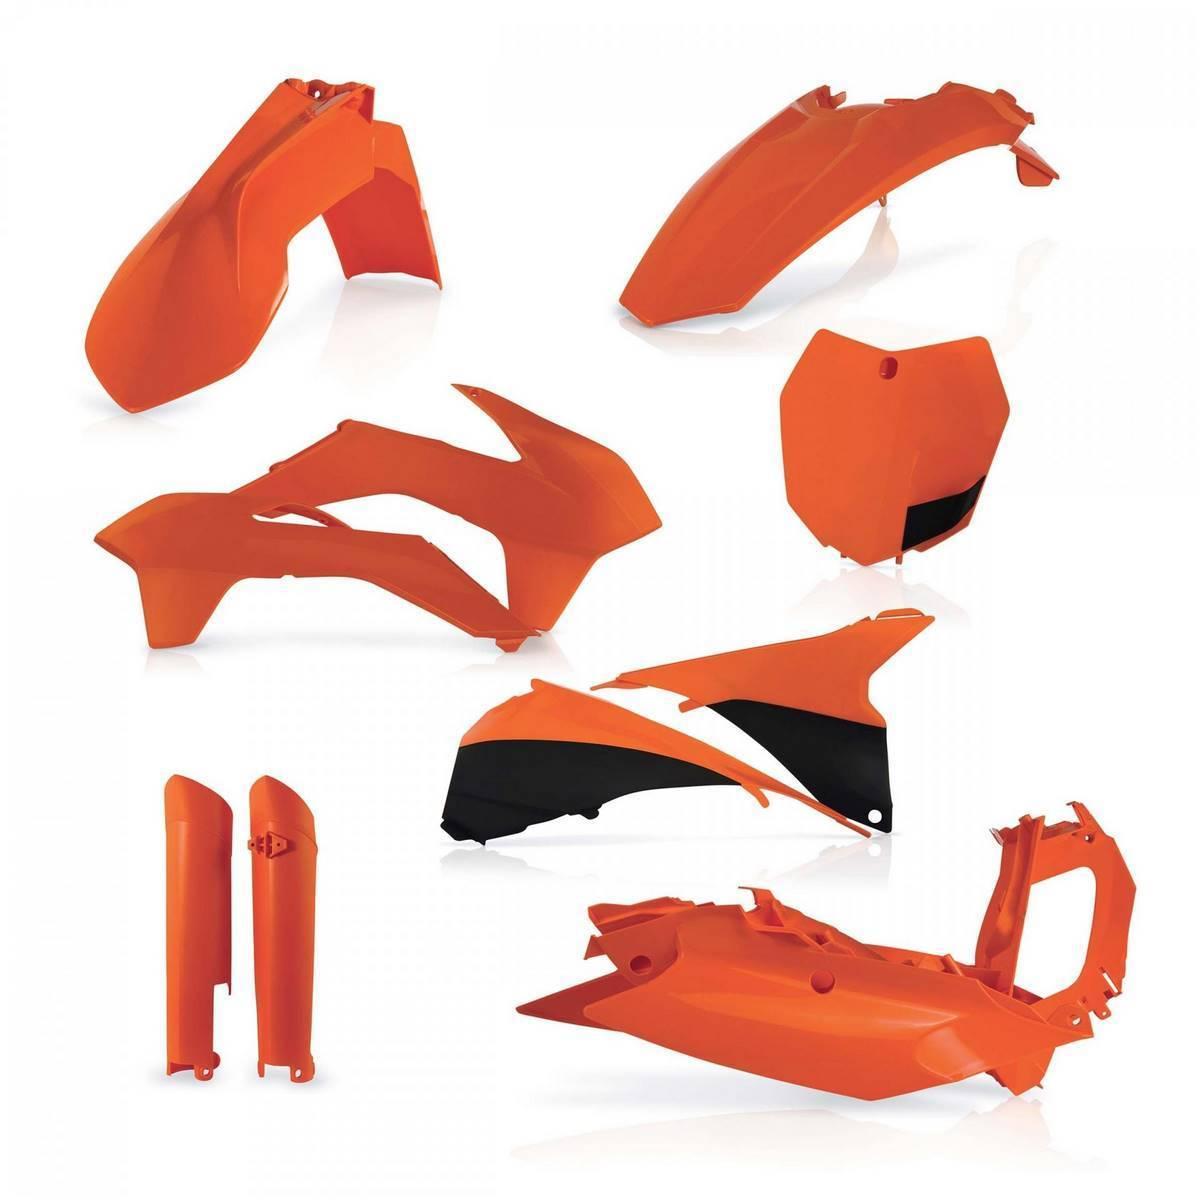 0016874-090 - Full Kit Plasticos Sxf 13 14 Negro